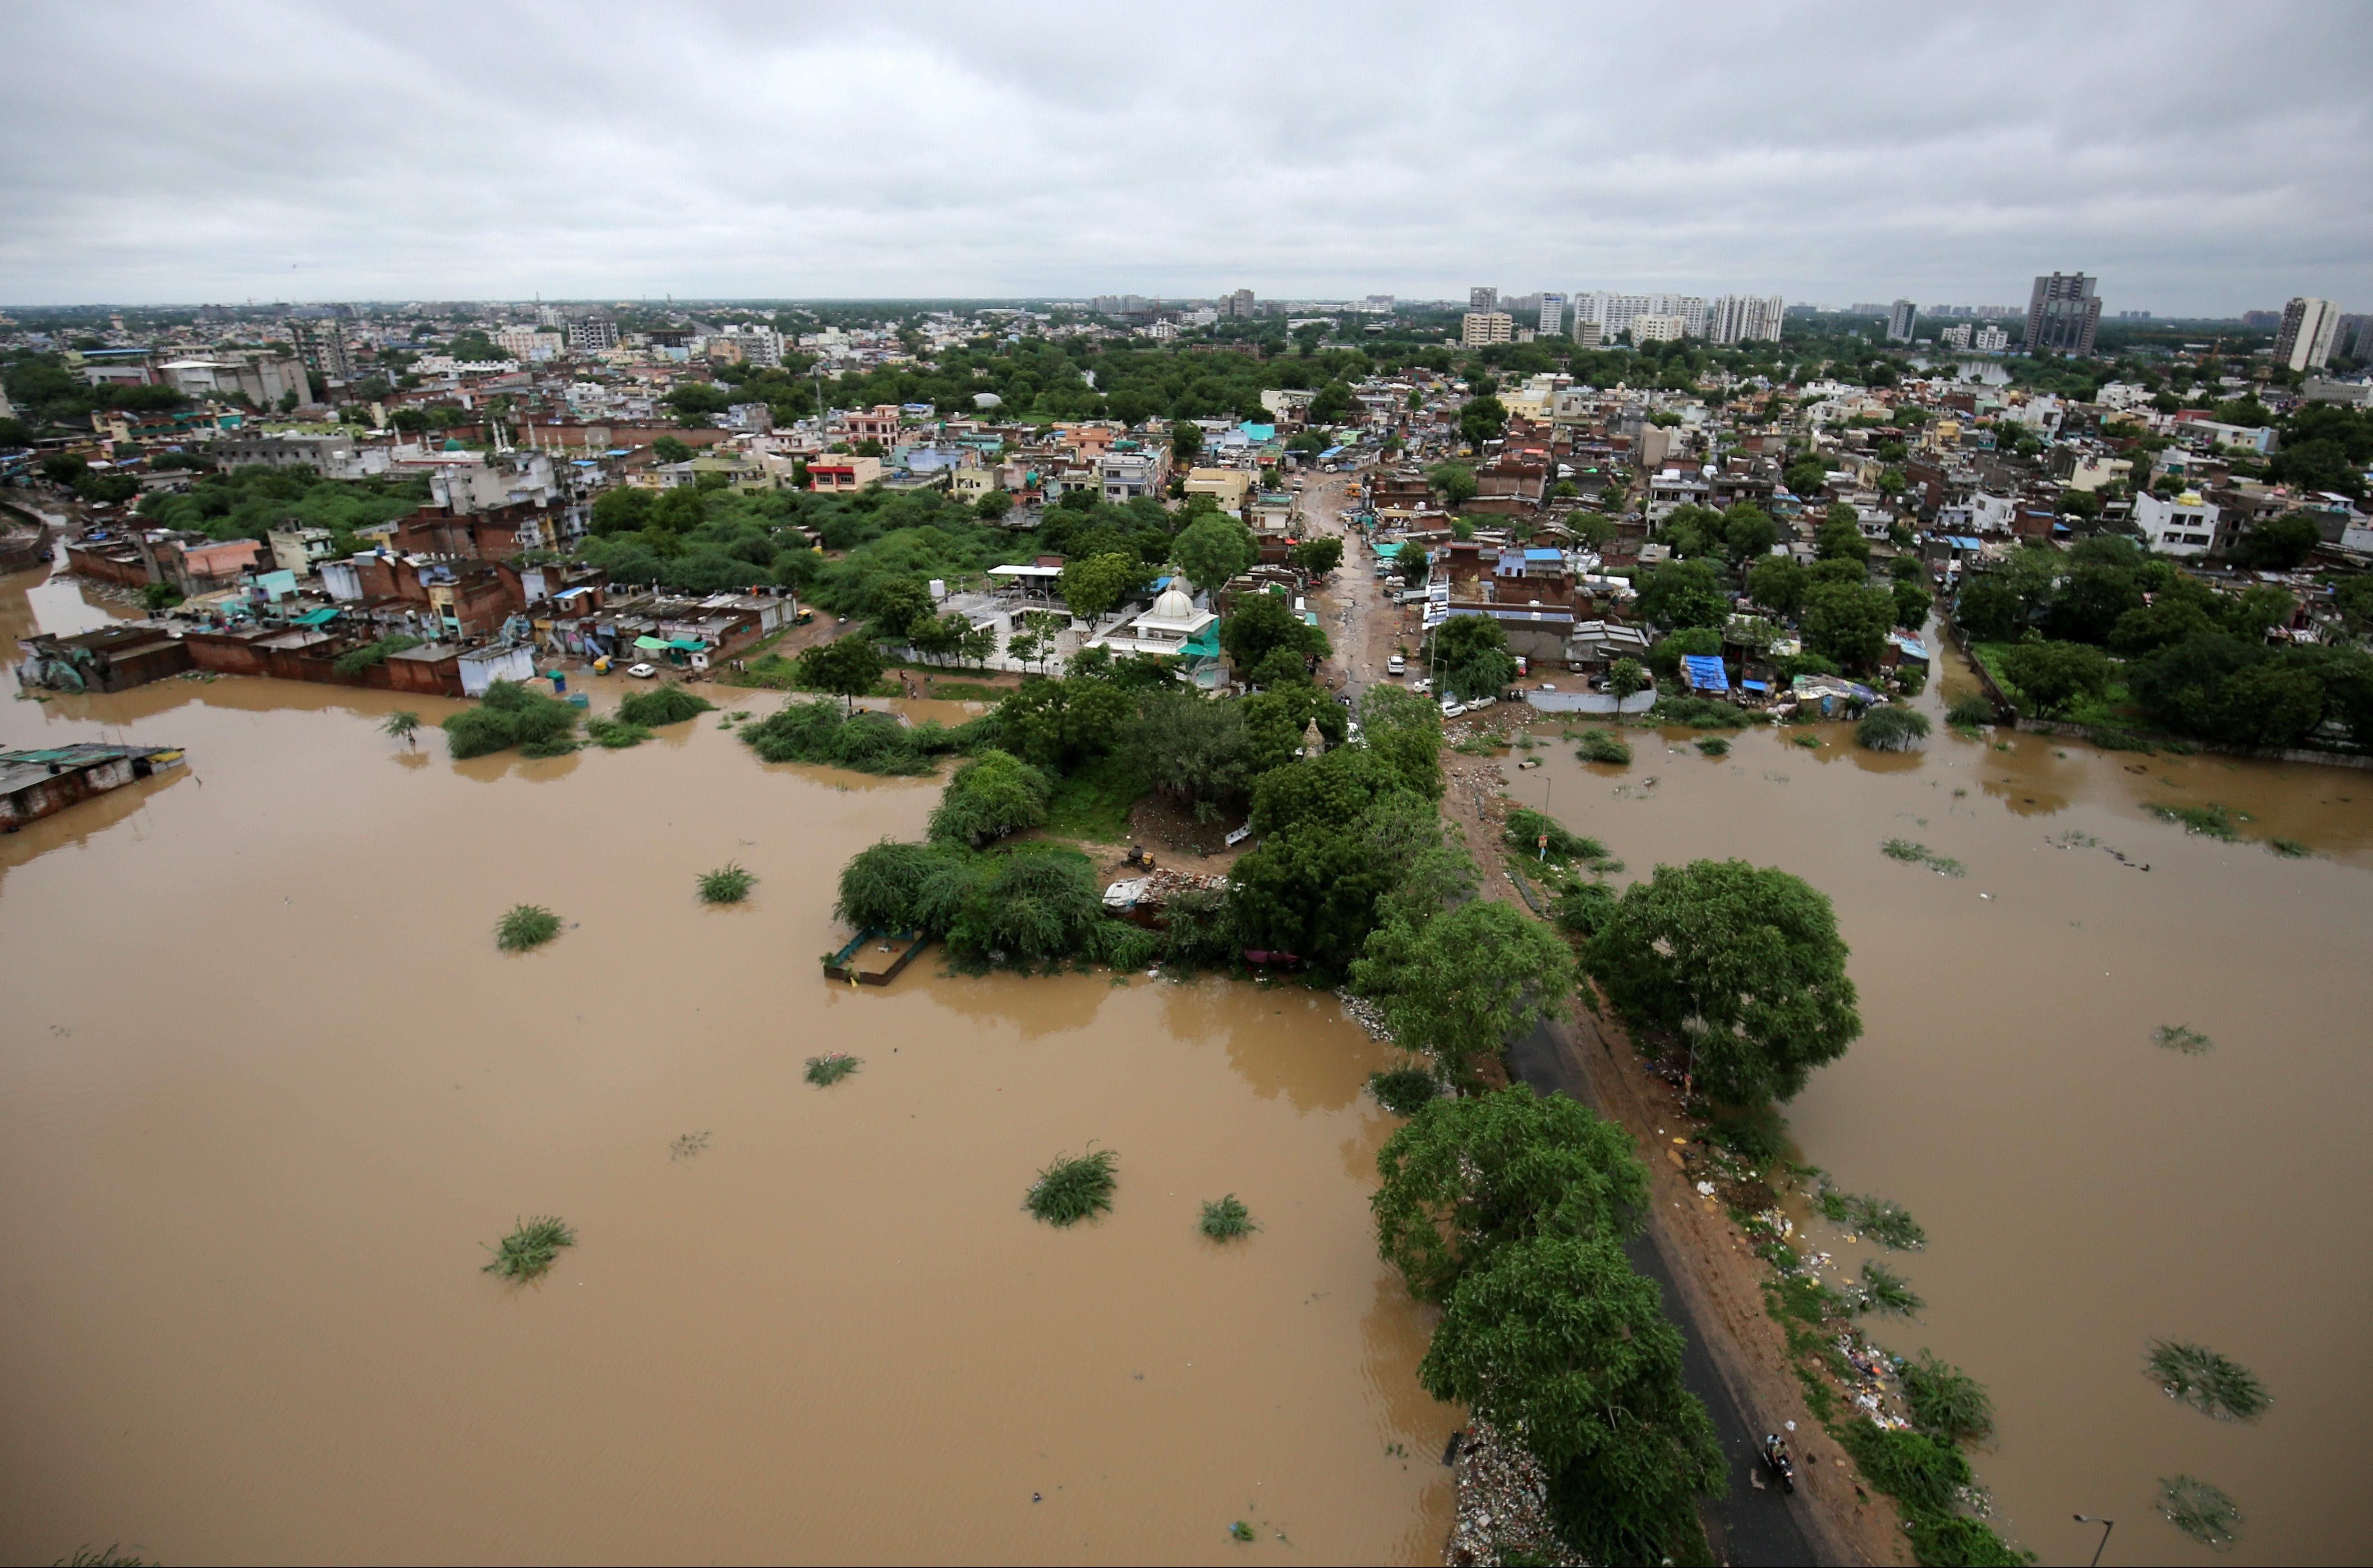 Destruction of India's Western Ghats causing devastating floods